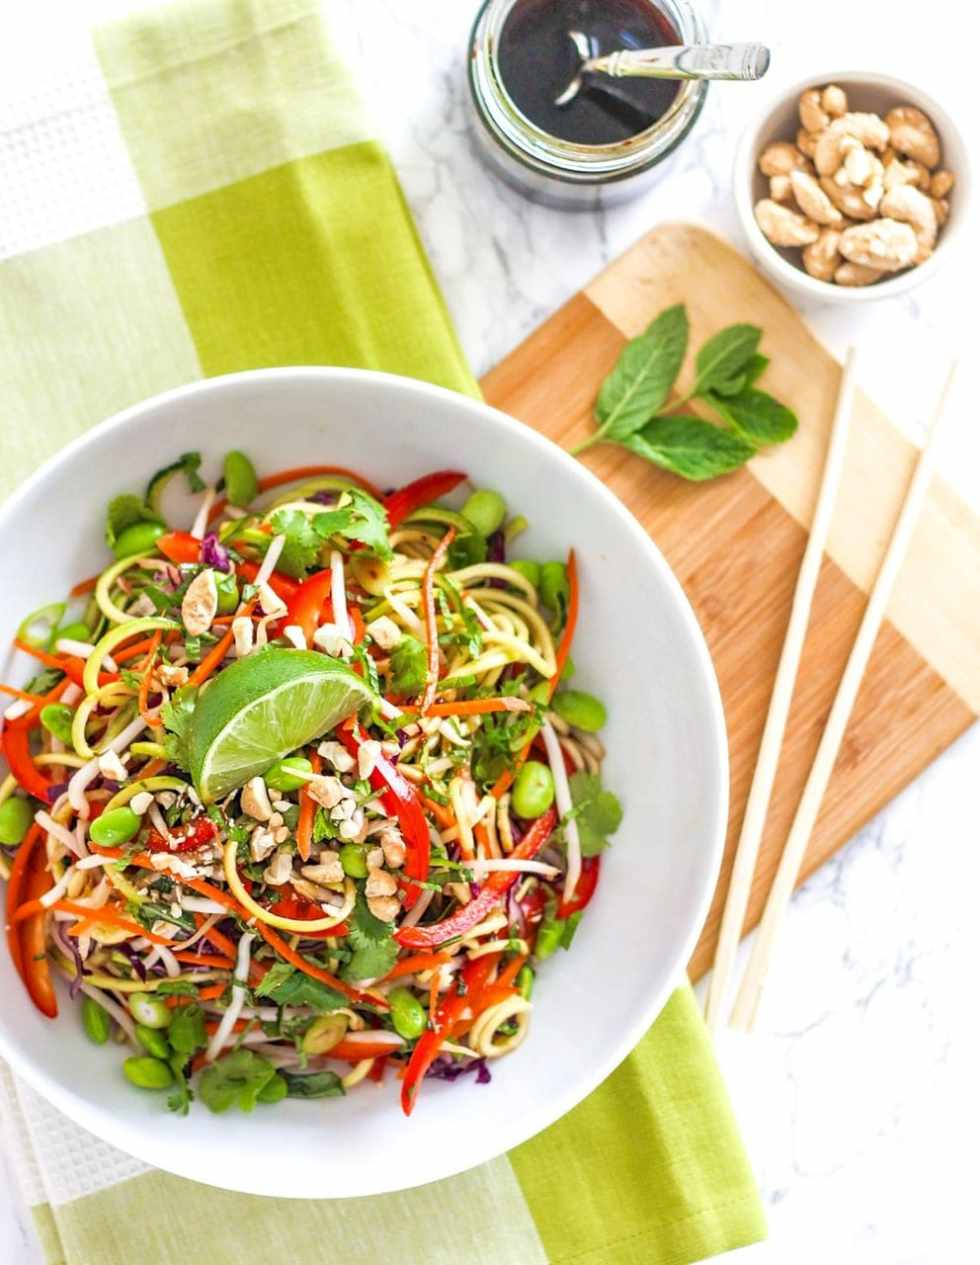 Bell Pepper Recipes: Vegan Zucchini Noodle Pad Thai